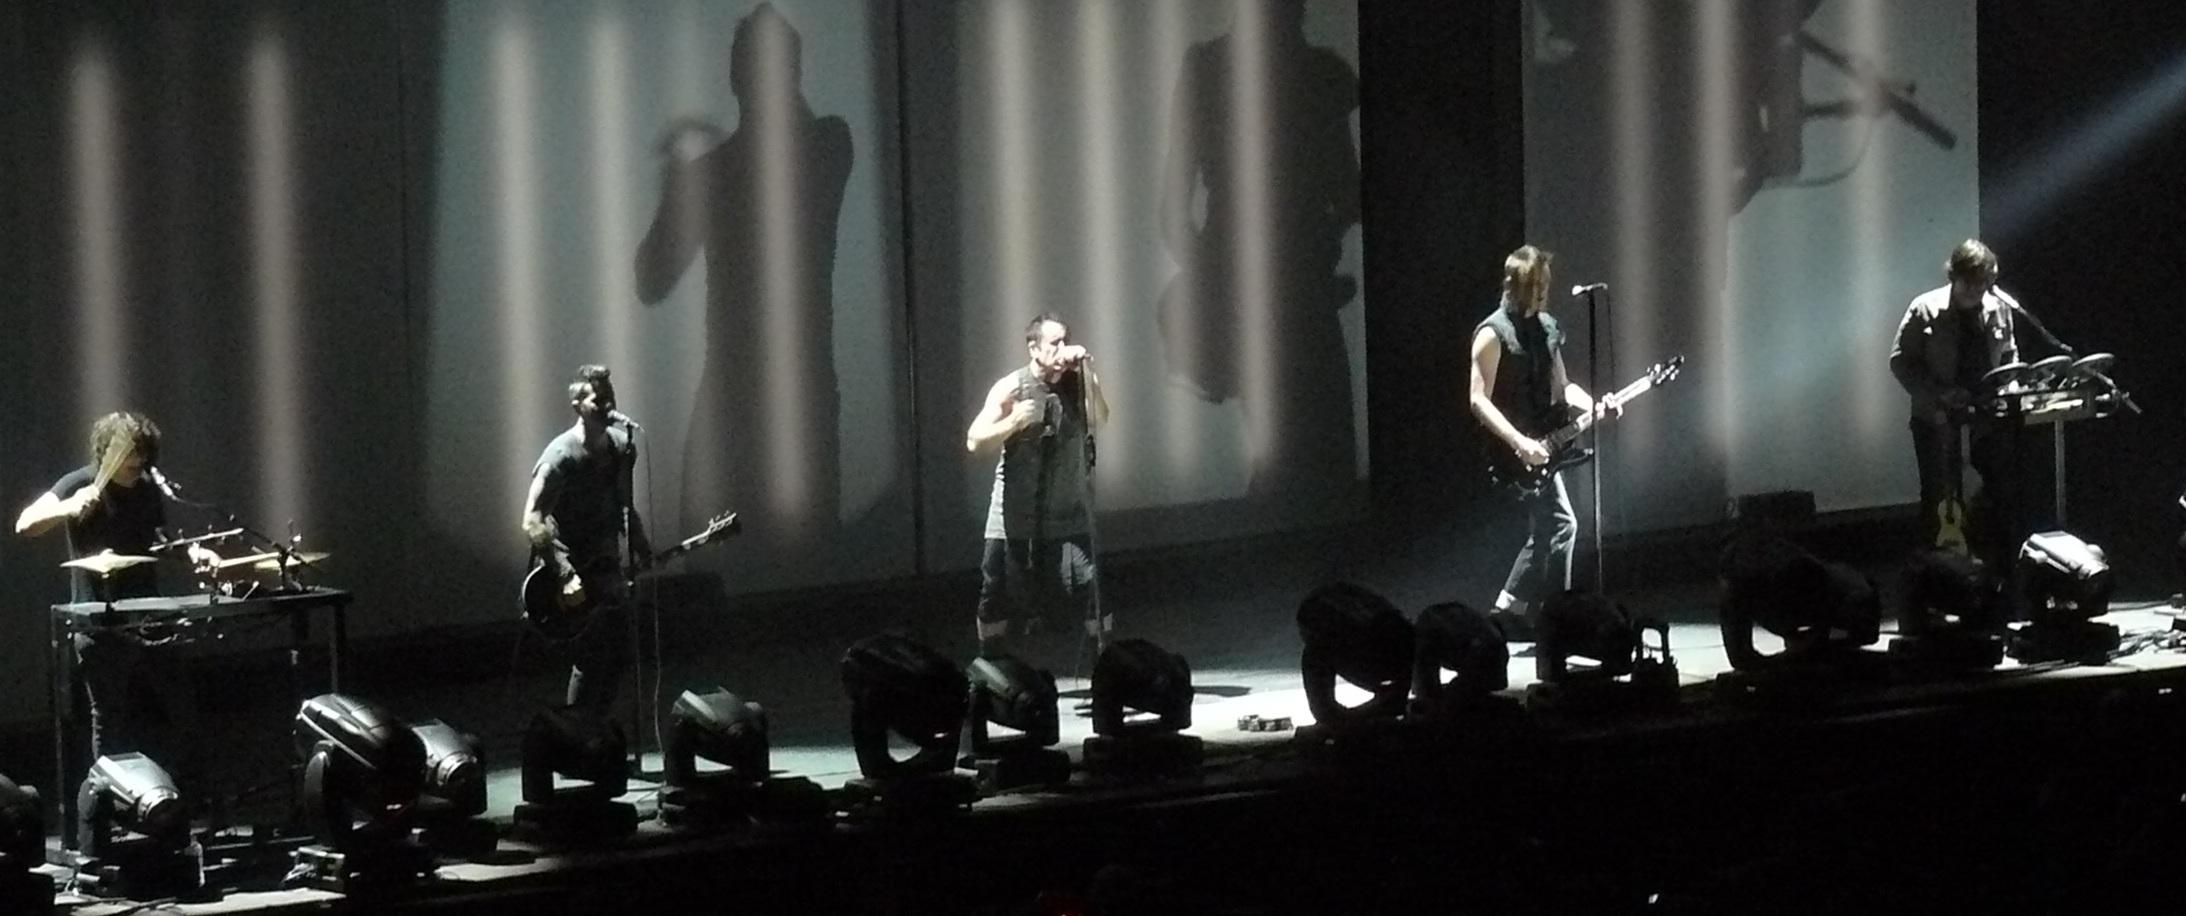 FileNine Inch Nails live at Mediolanum Forum Milan in